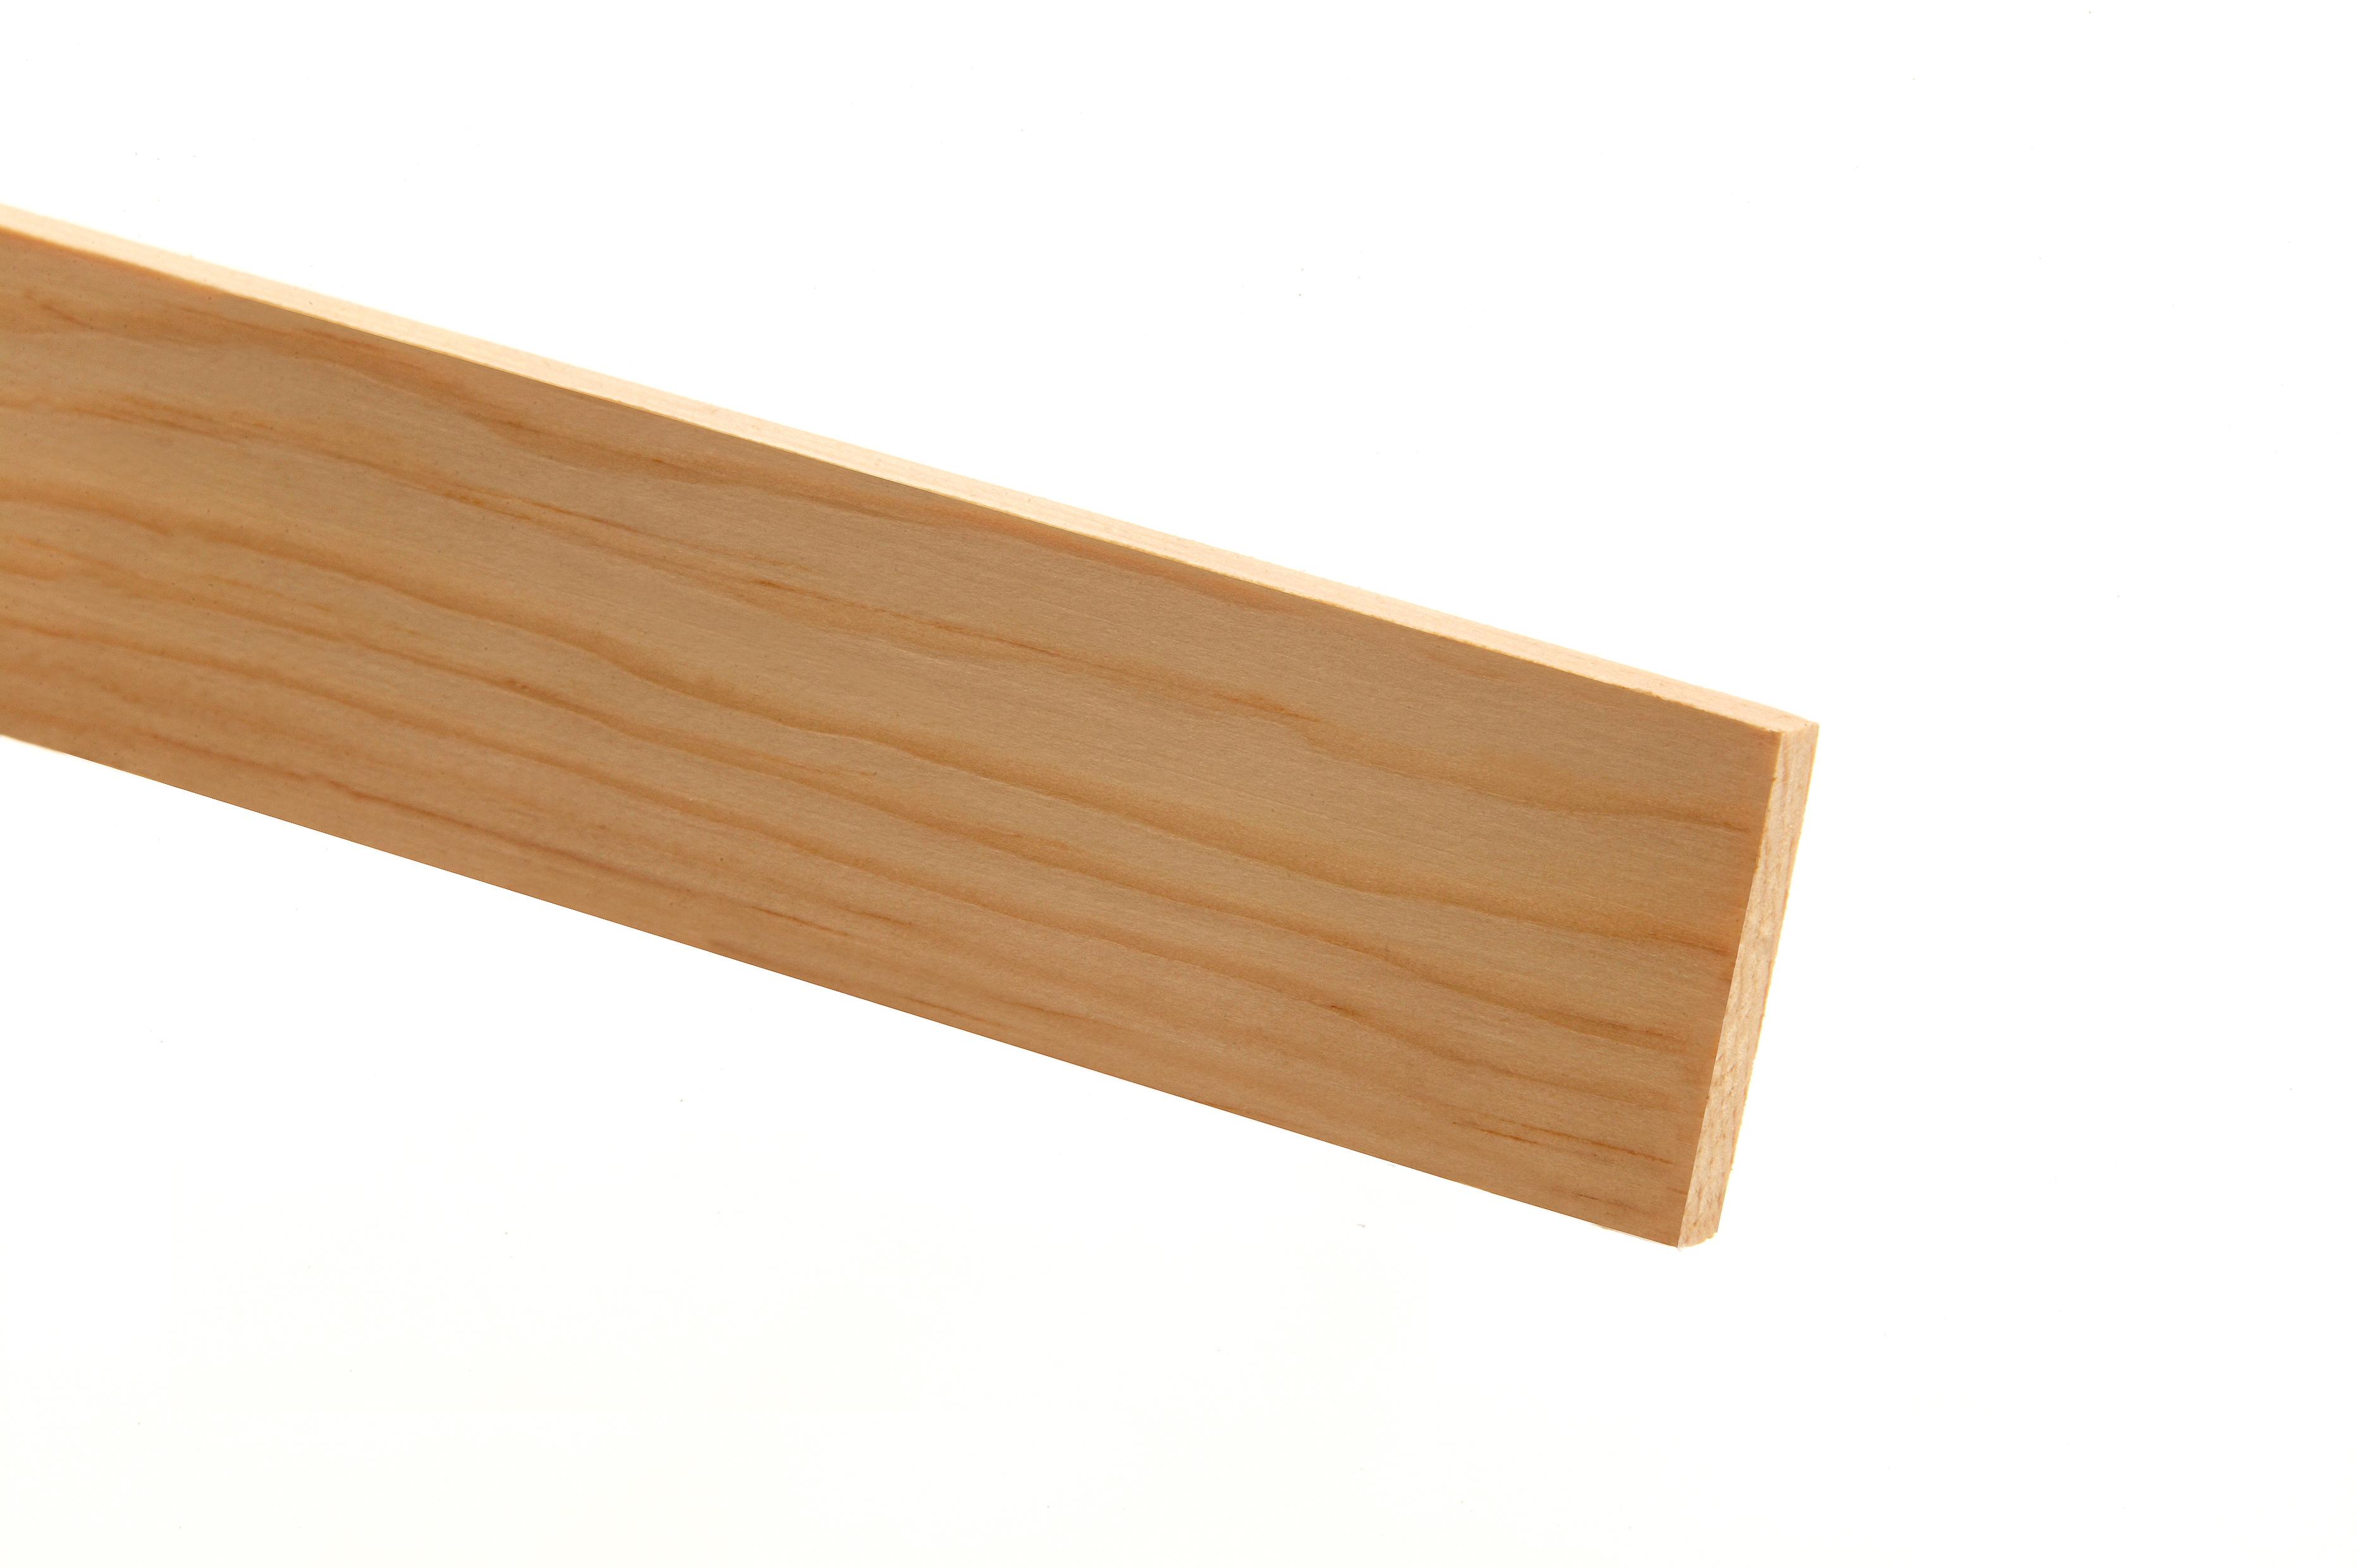 10 Pine PSE Stripwood 12 x 145 x 2400mm